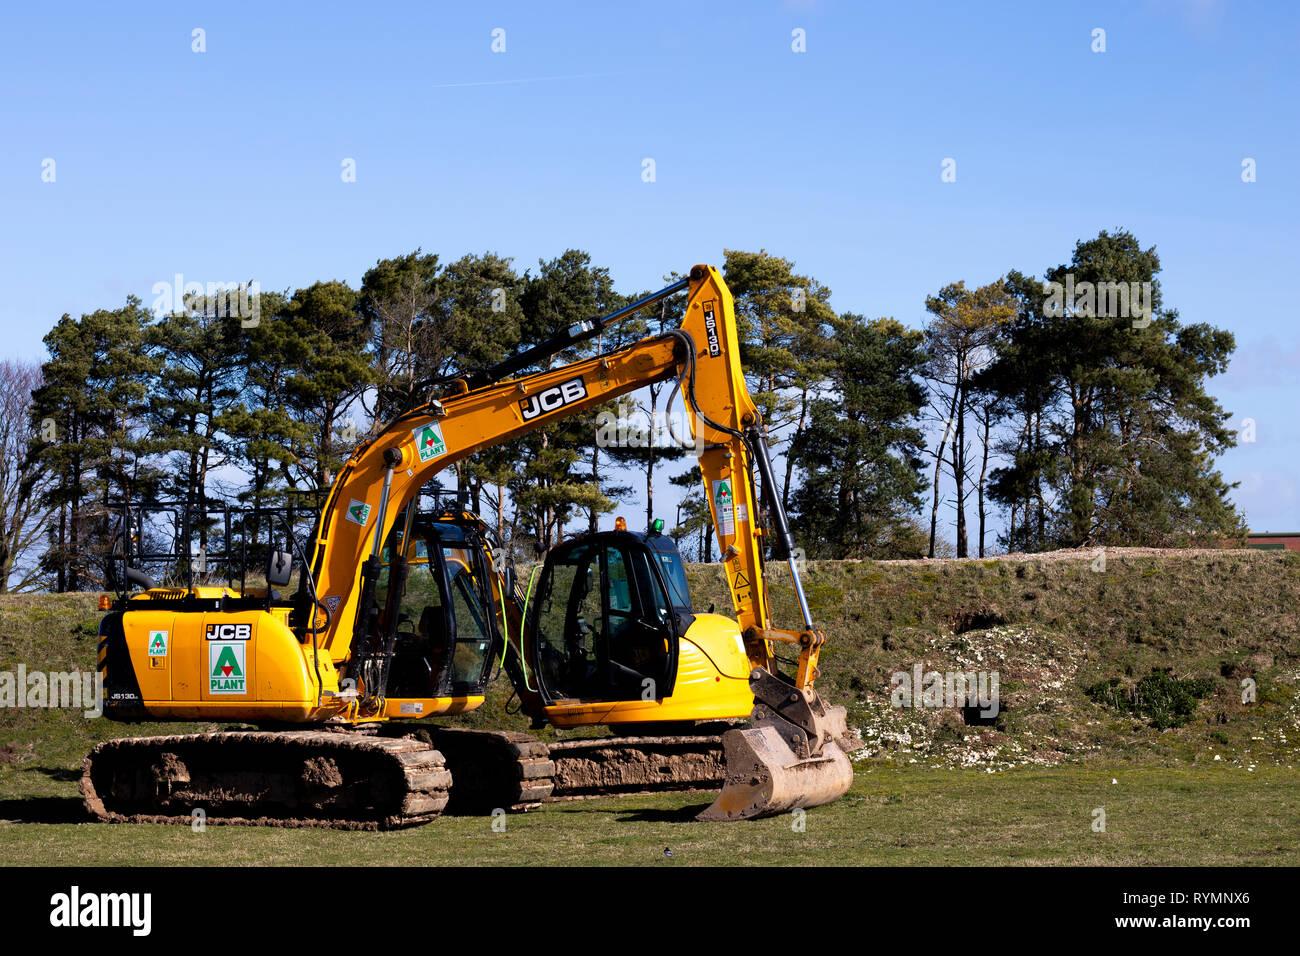 construction site excavators parked on grass area adjacent to building site - Stock Image